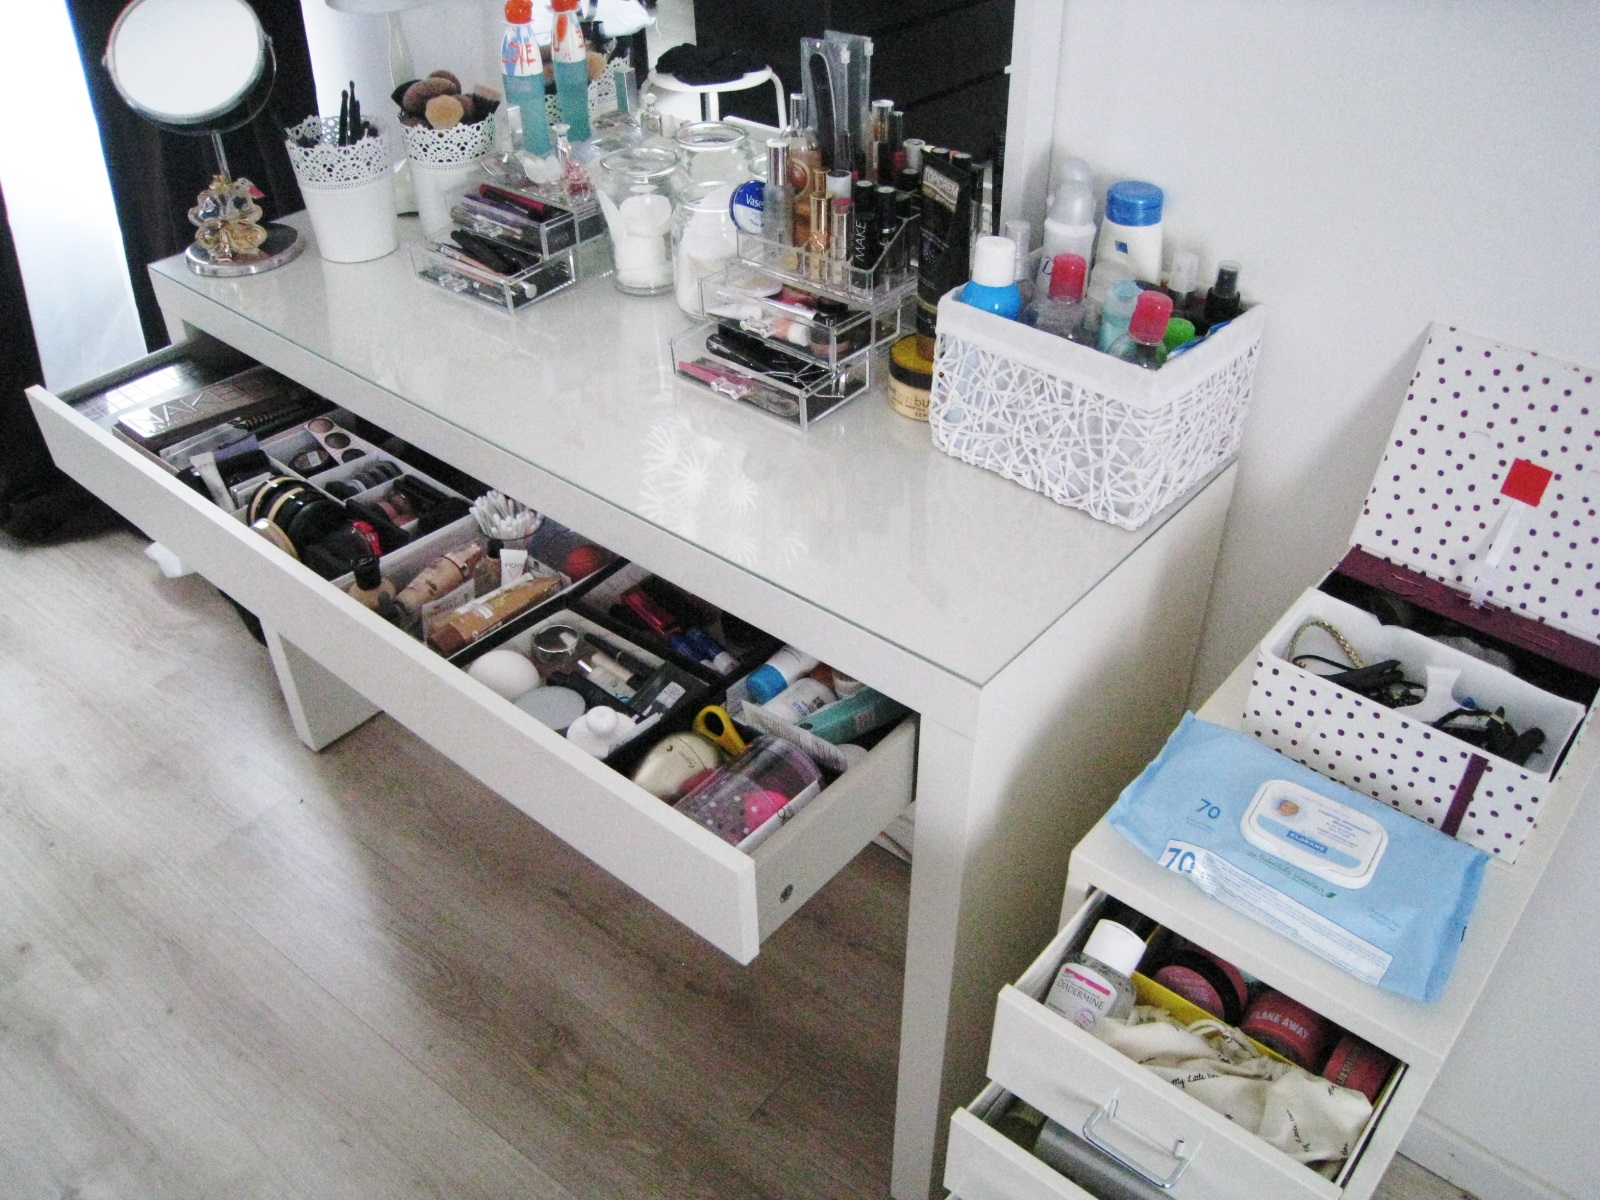 peachy lilie33 mon rangement makeup soins new. Black Bedroom Furniture Sets. Home Design Ideas